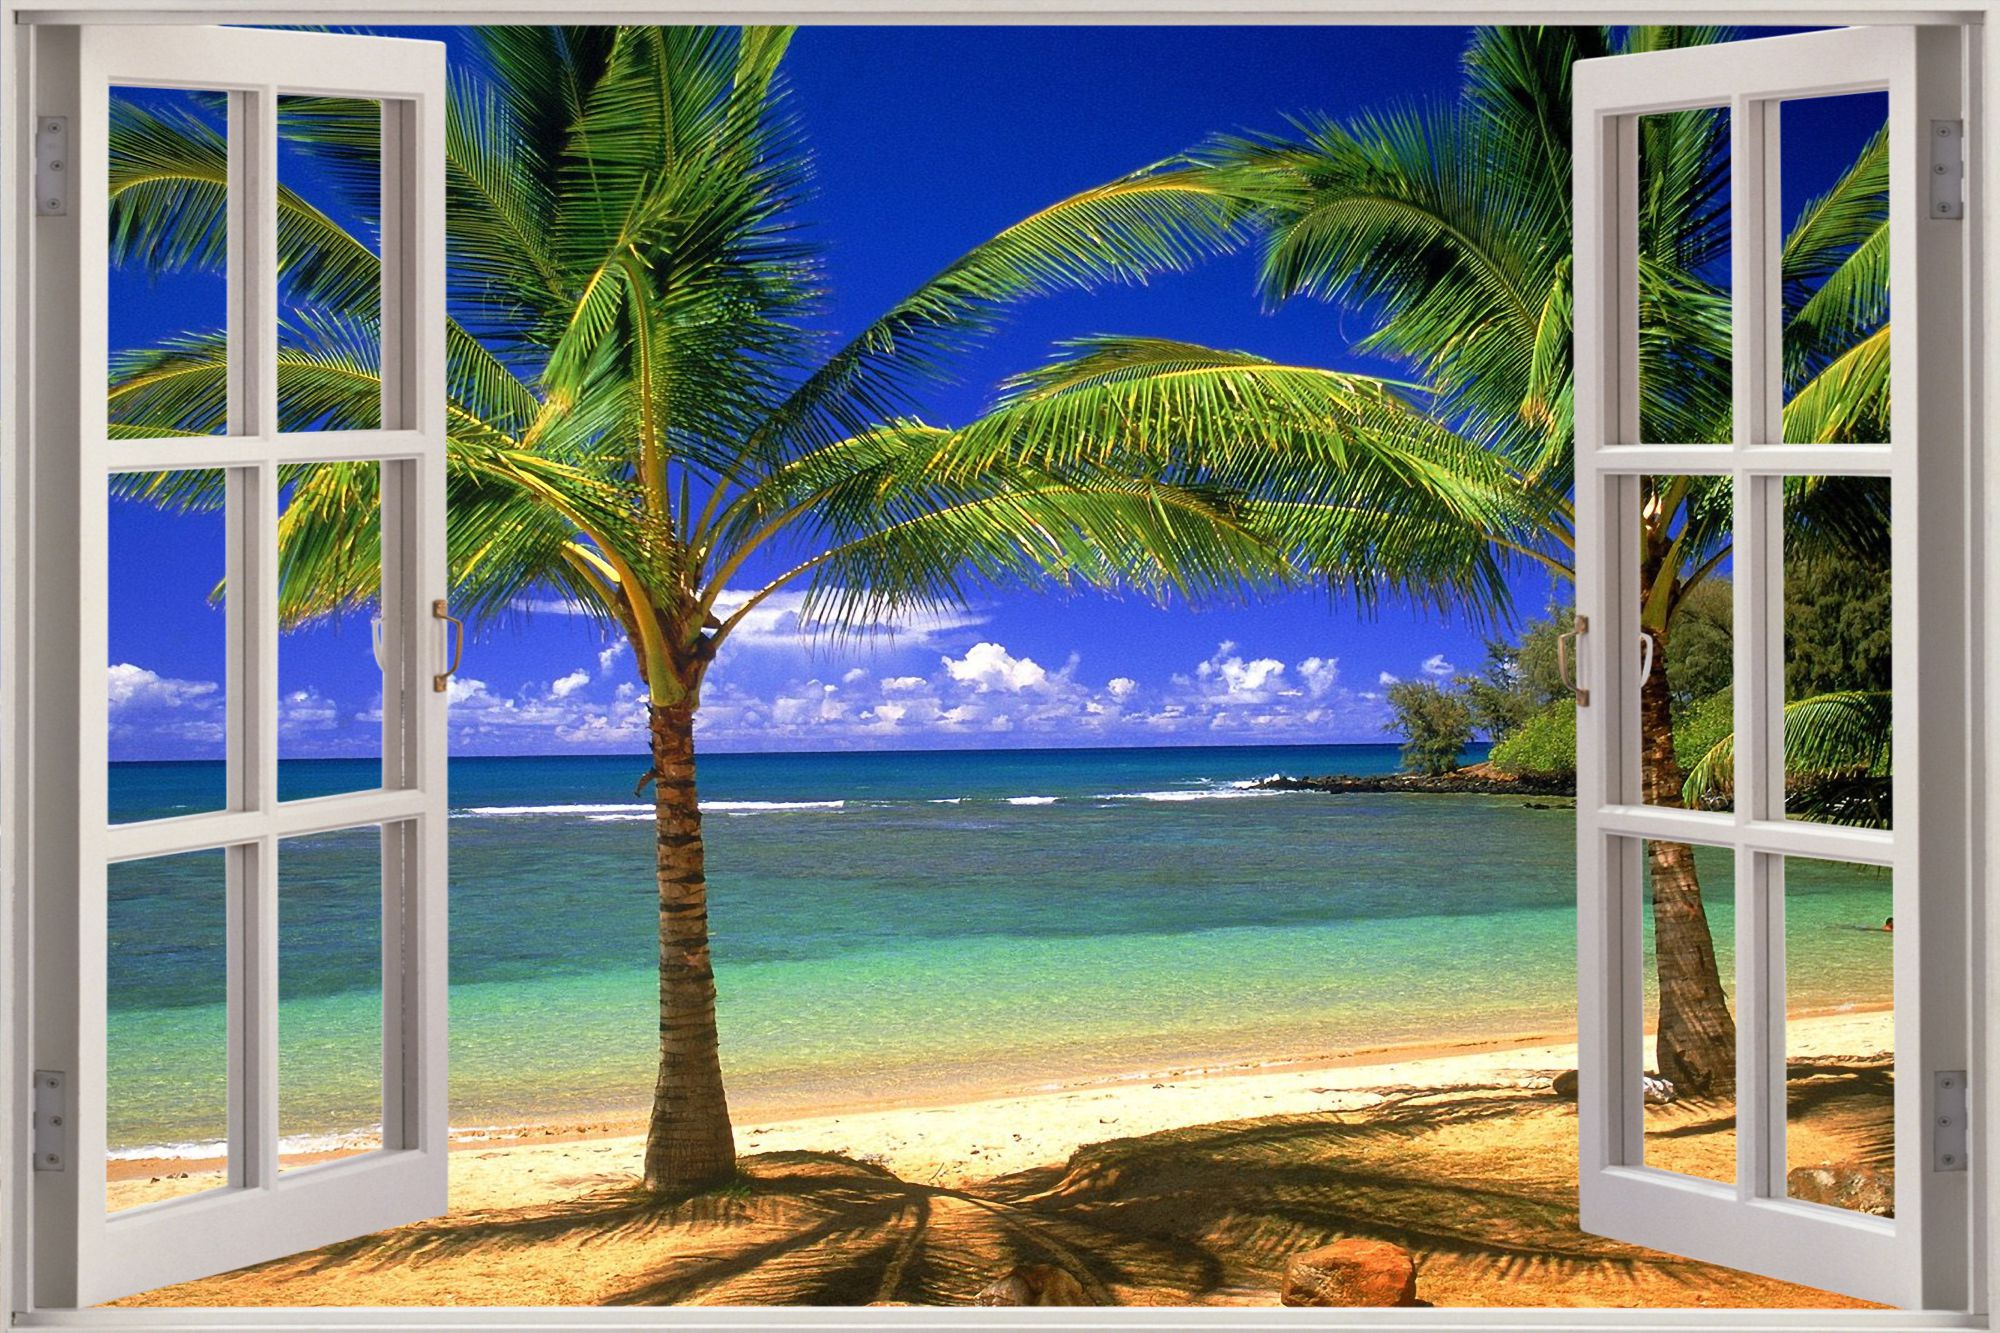 Exotic Beach View Wall Stickers Film Mural Art Decal Wallpaper eBay 2000x1333